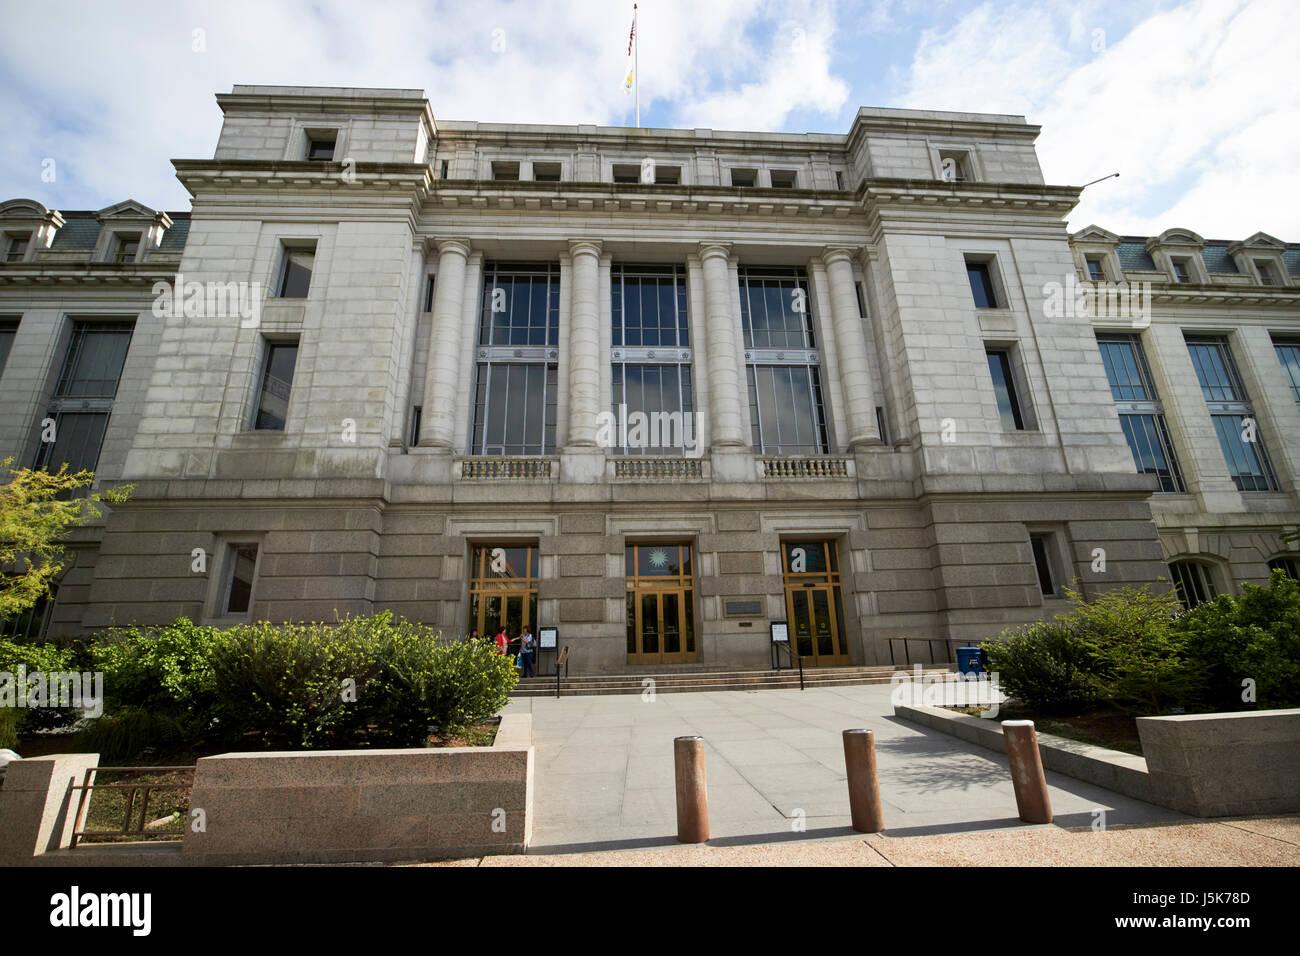 smithsonian national museum of natural history Washington DC USA - Stock Image